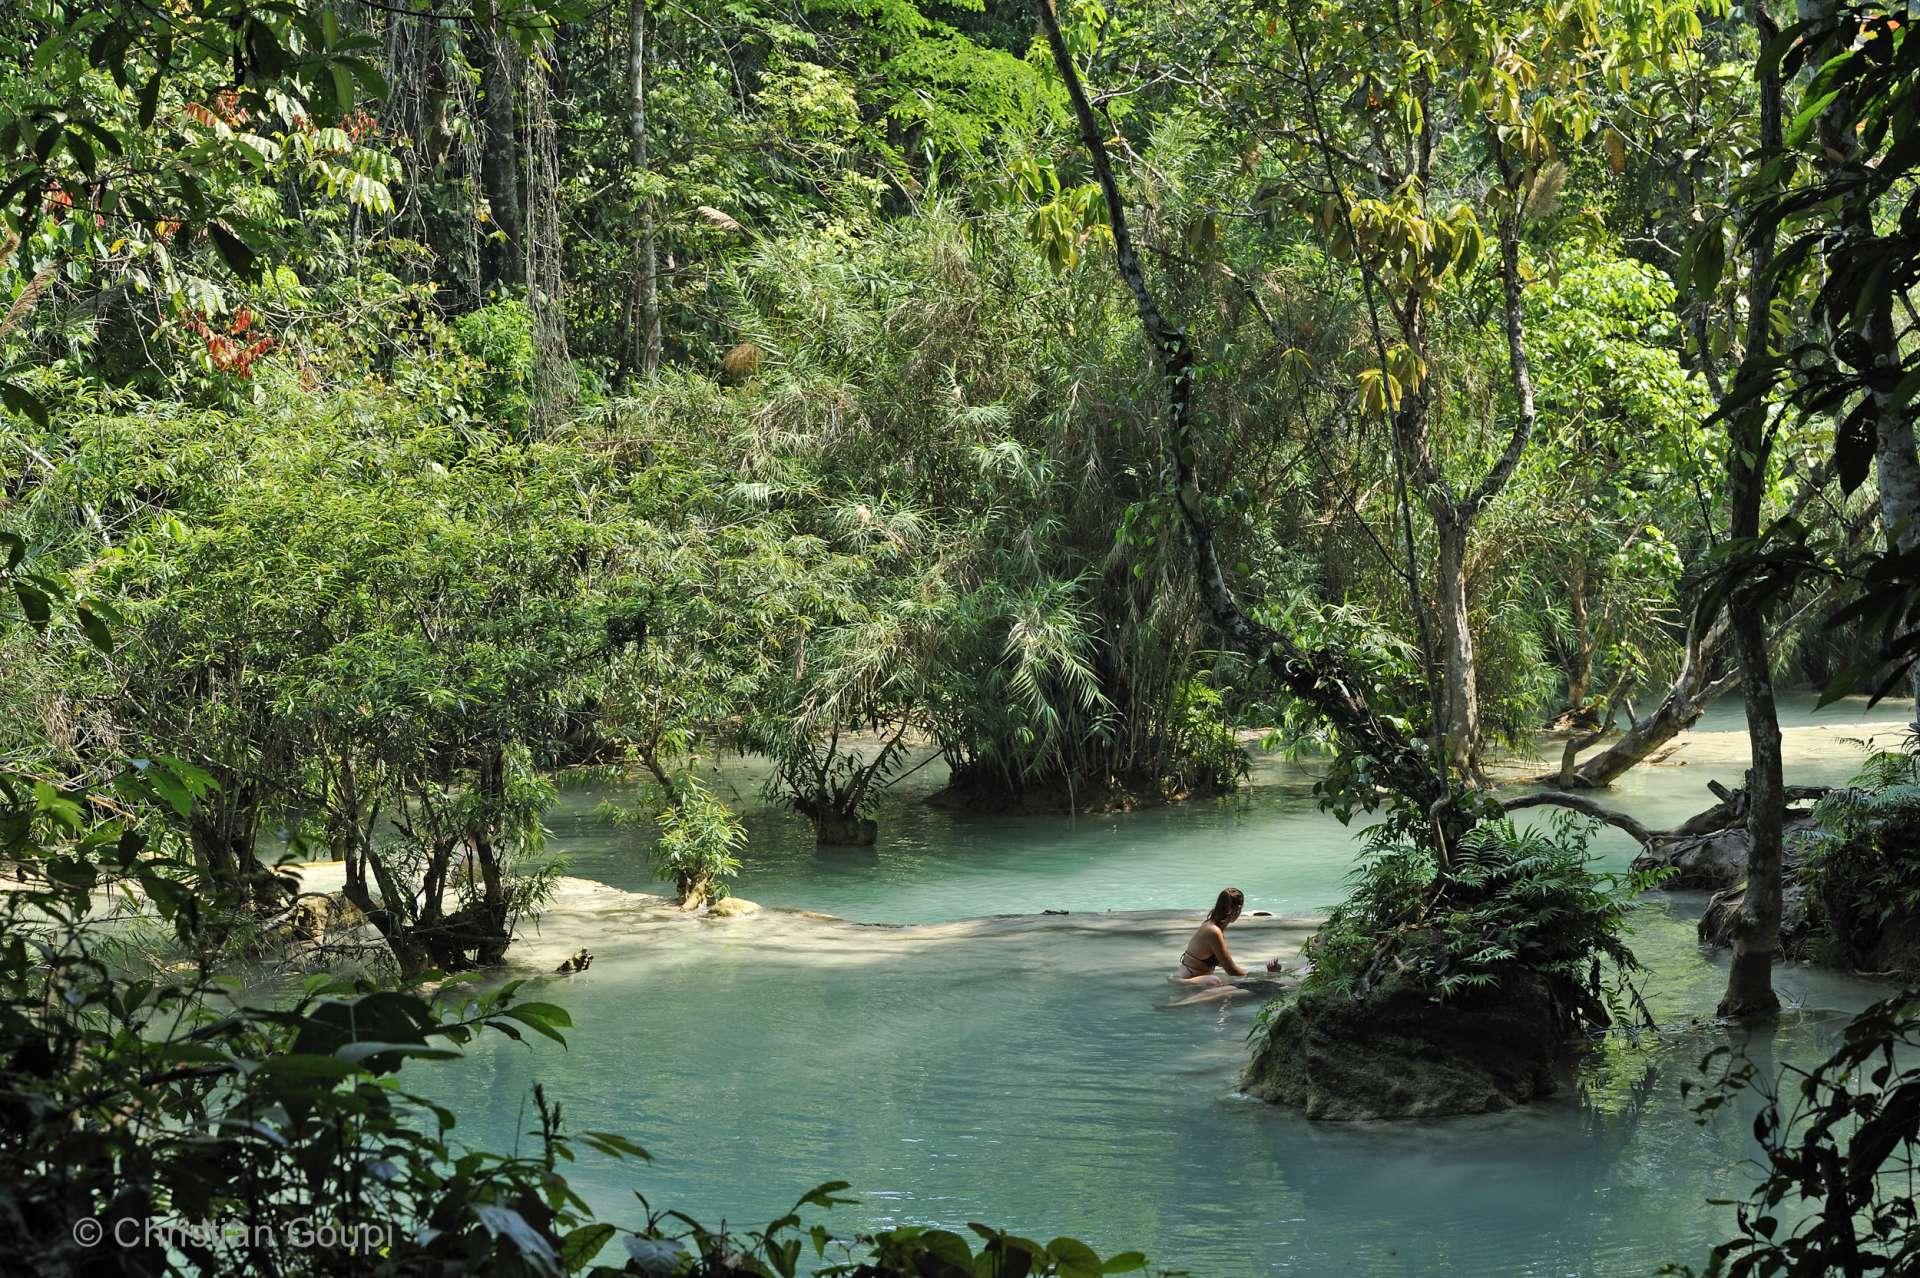 Laos - Baignade idyllique au pied des chutes de Kuang Si, à quelques kilomètres de Luang Prabang.